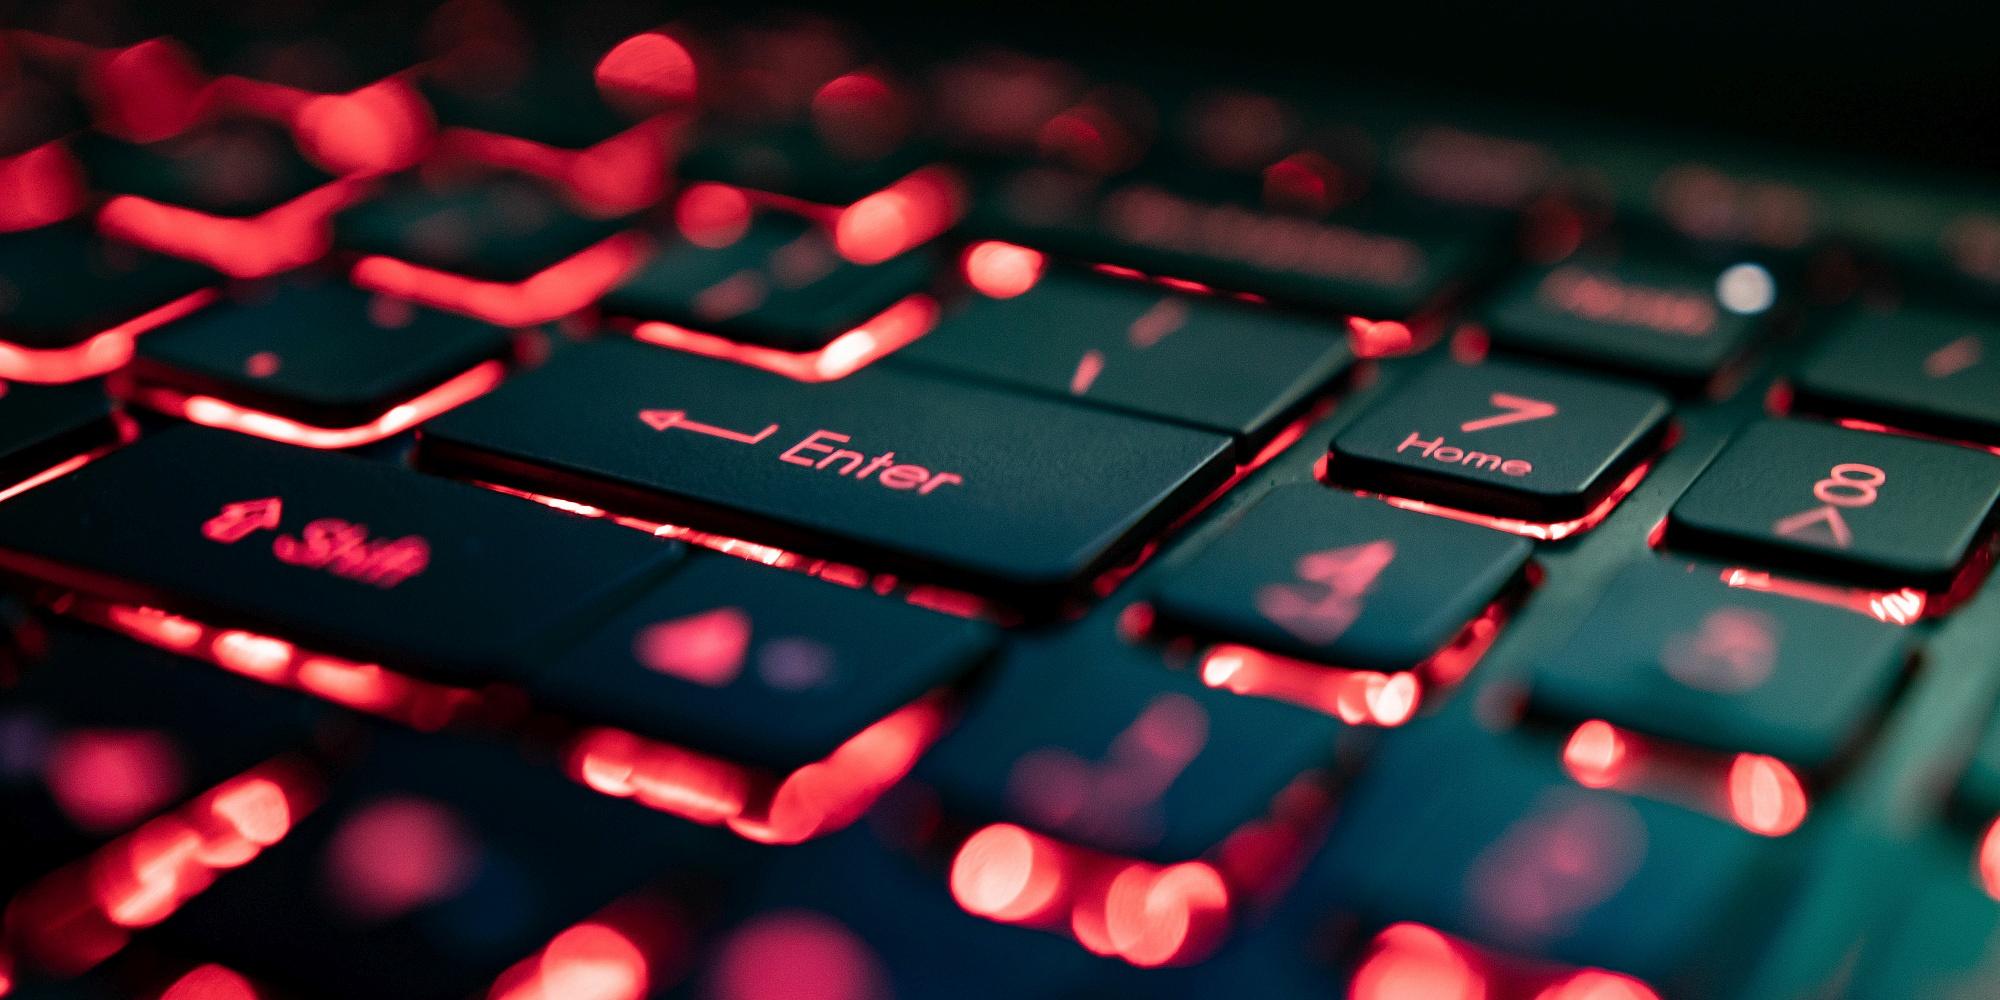 gaming-laptop-tastatur